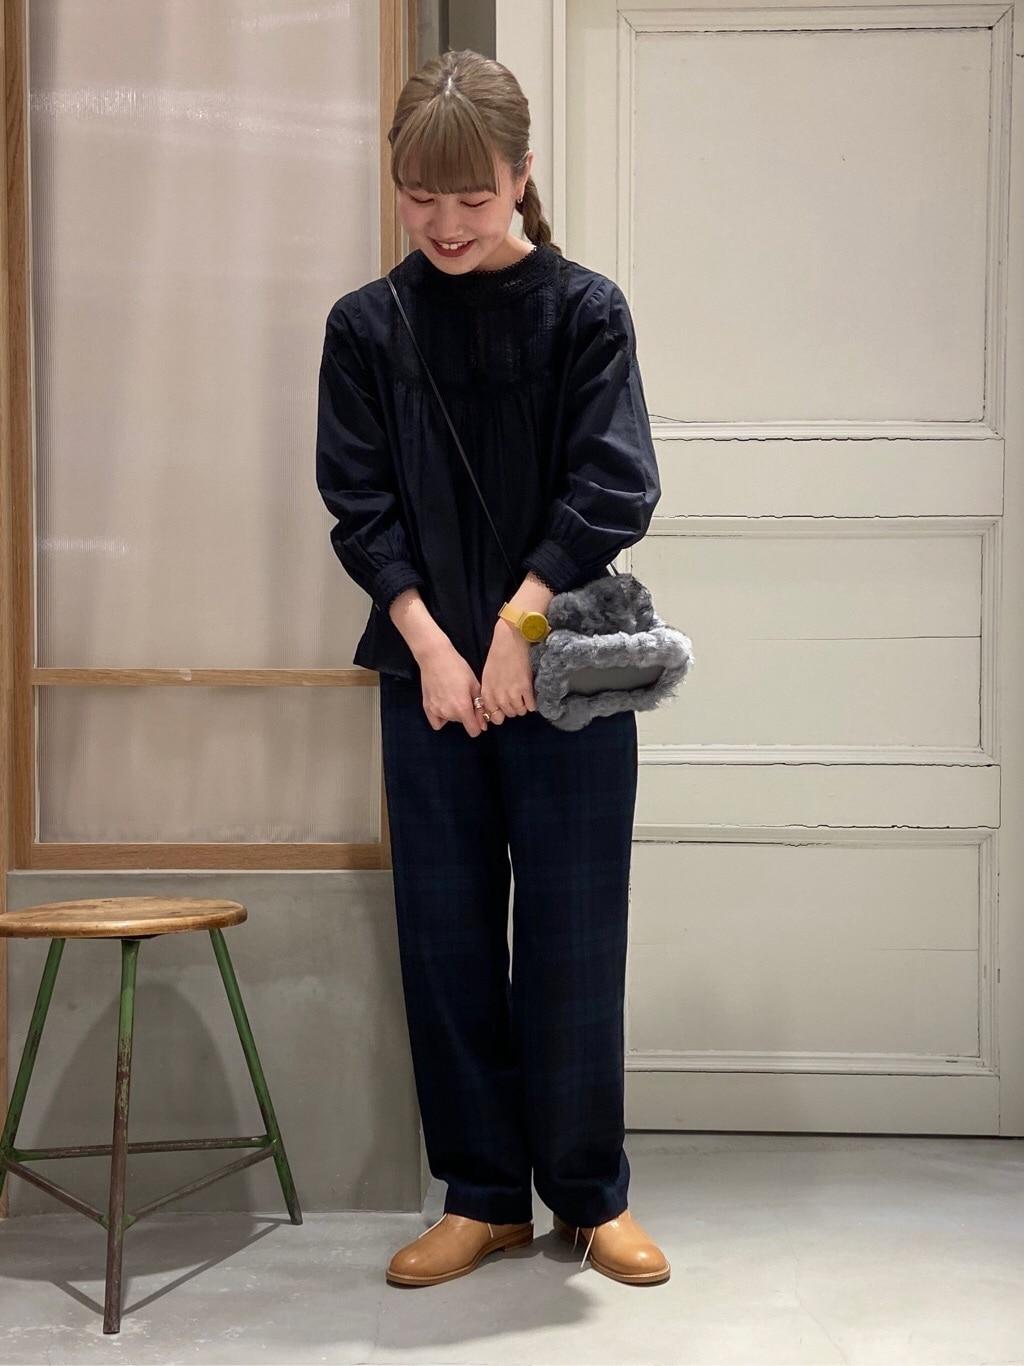 bulle de savon 渋谷スクランブルスクエア 身長:160cm 2020.11.30